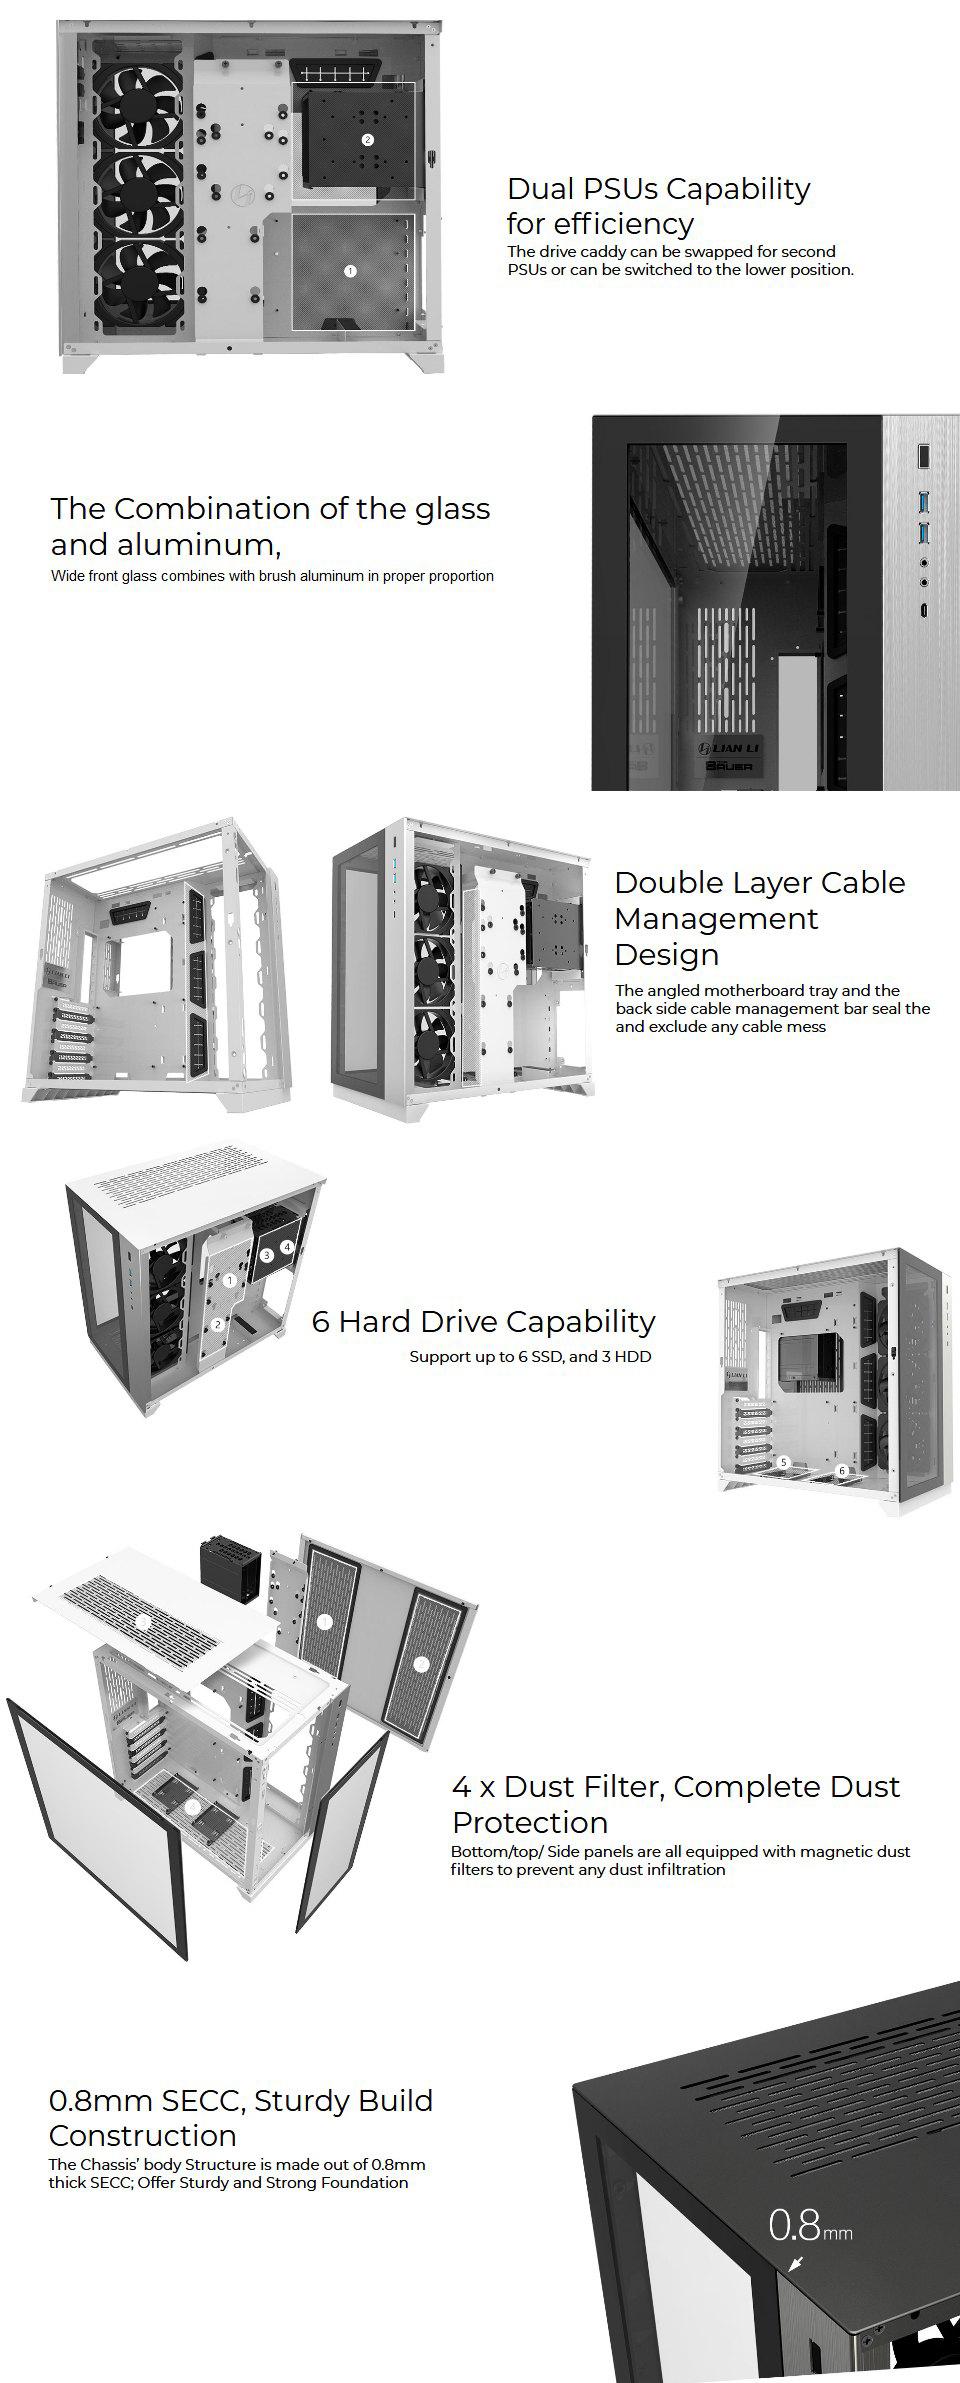 Lian Li PC-O11 Dynamic XL PCMR Limited Edition Case features 4